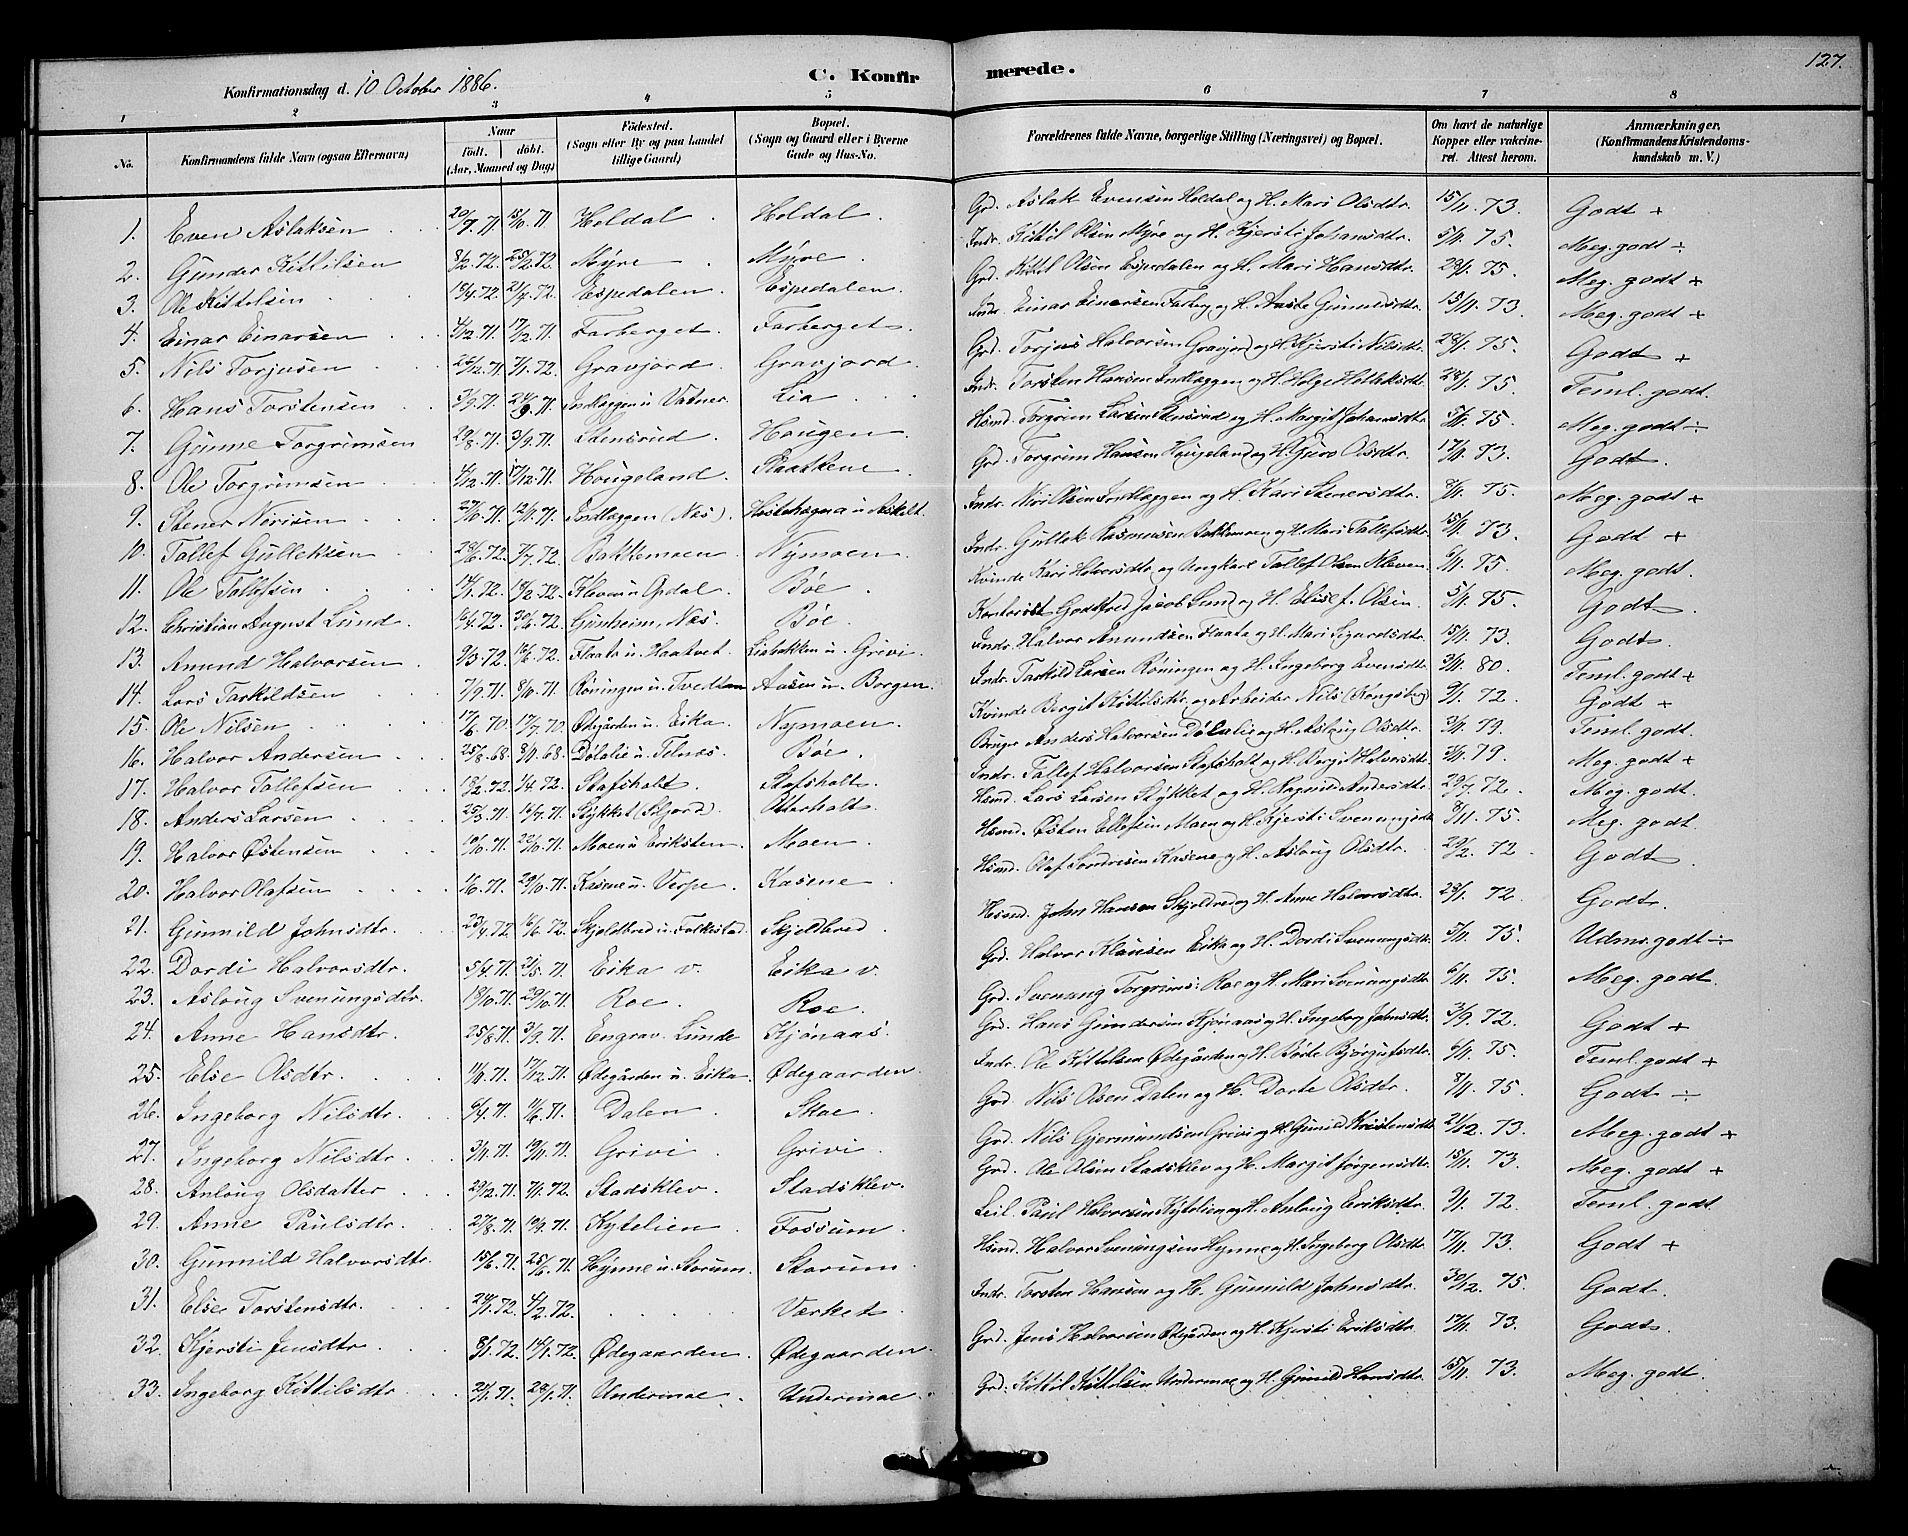 SAKO, Bø kirkebøker, G/Ga/L0005: Klokkerbok nr. 5, 1883-1897, s. 127